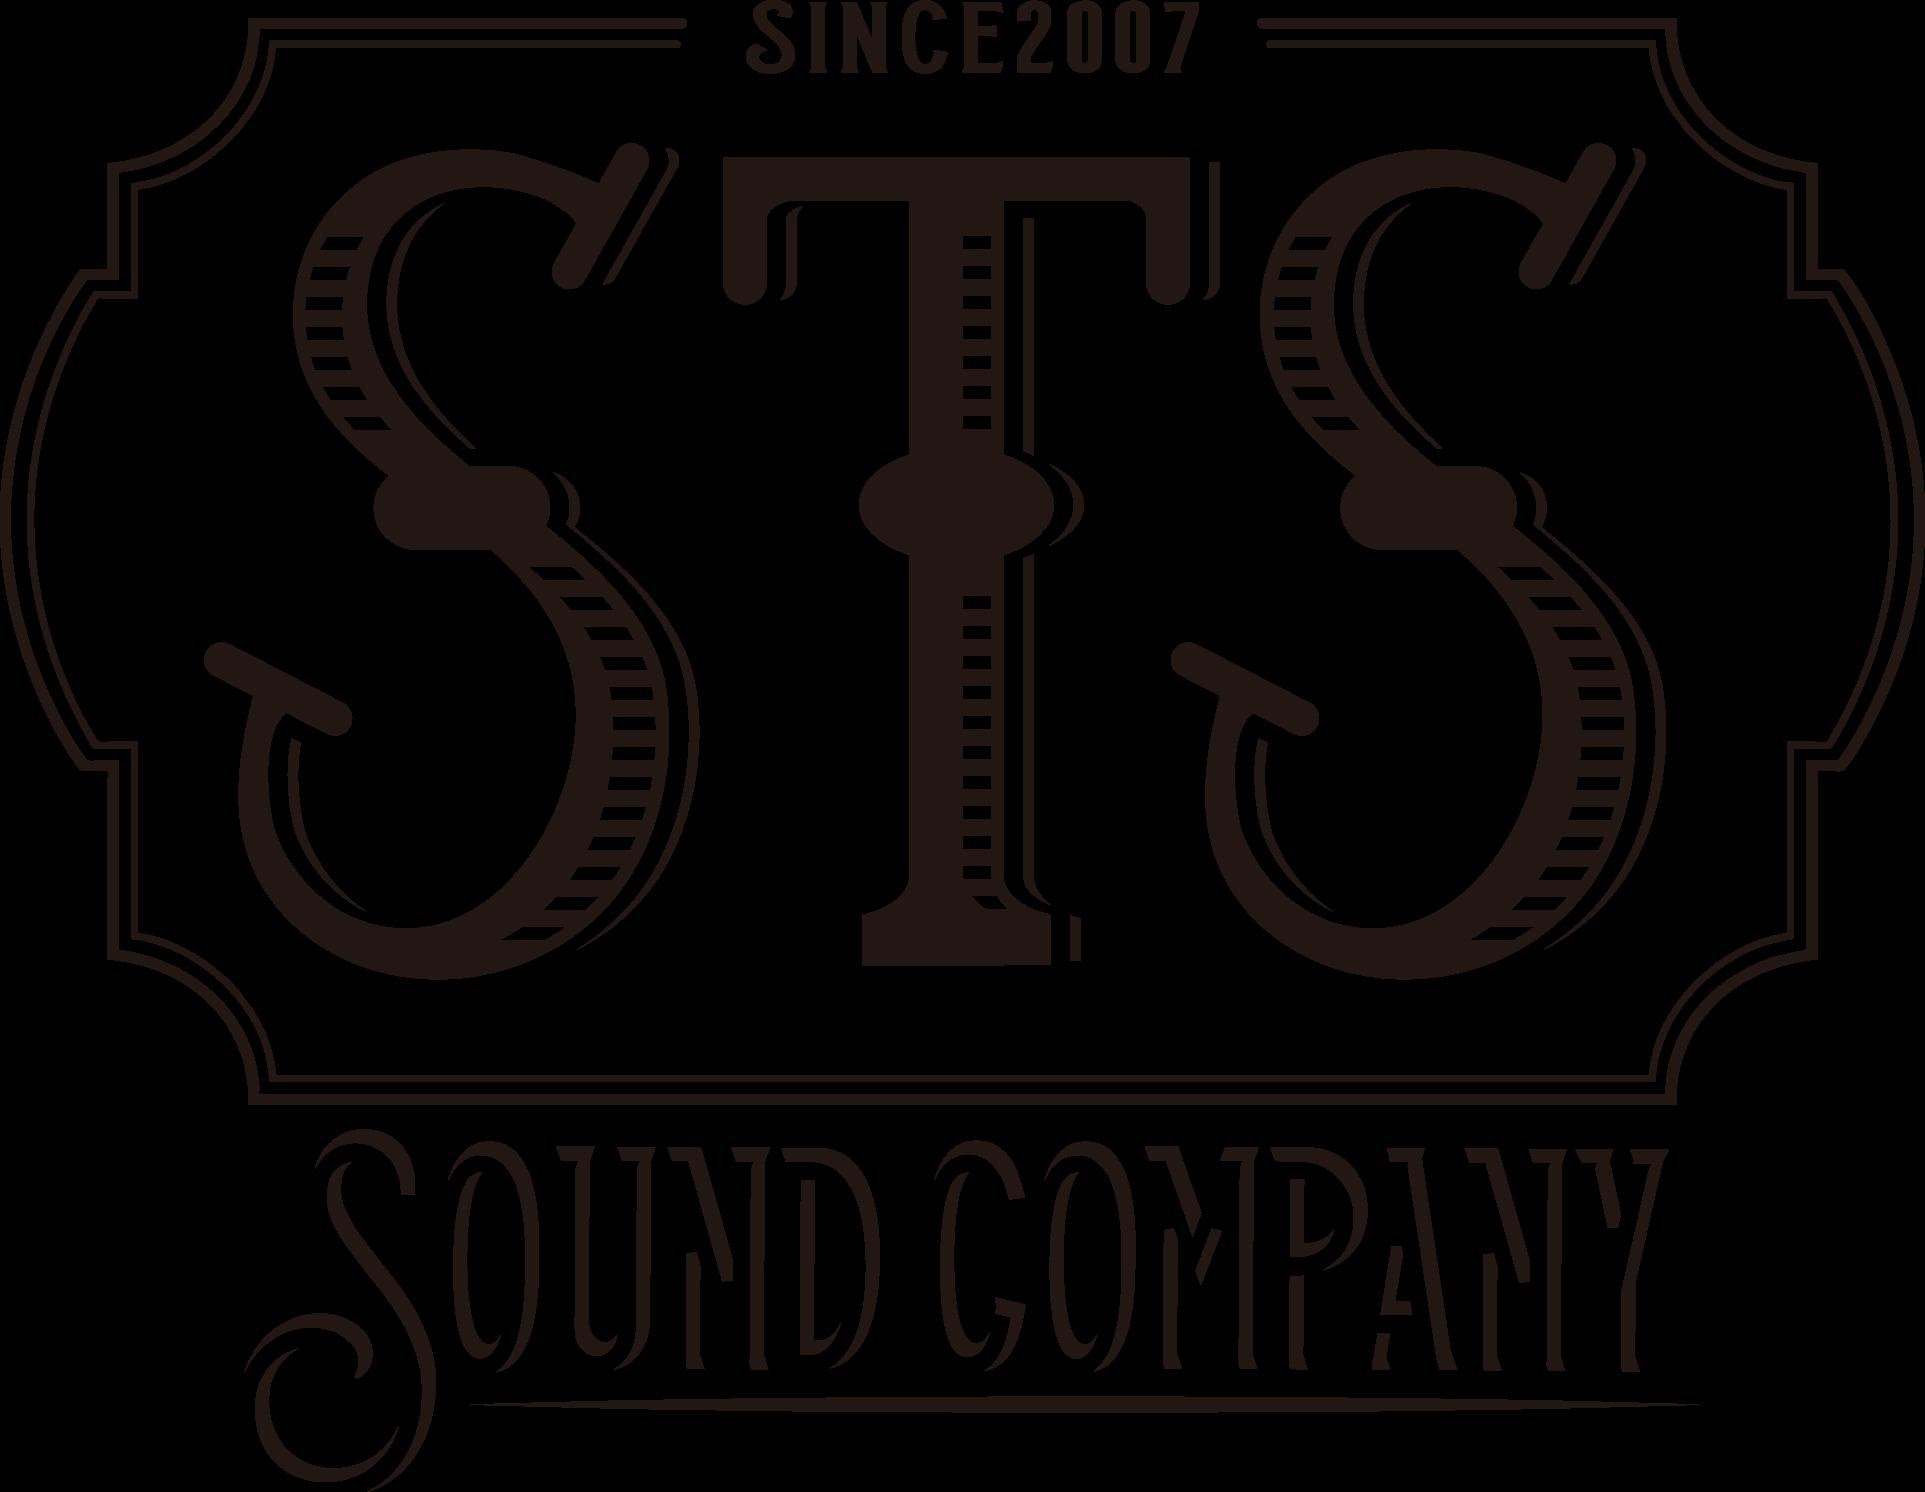 STS | 福岡の音楽スタジオ レコーディング リハーサル 楽曲制作 音響機材レンタル